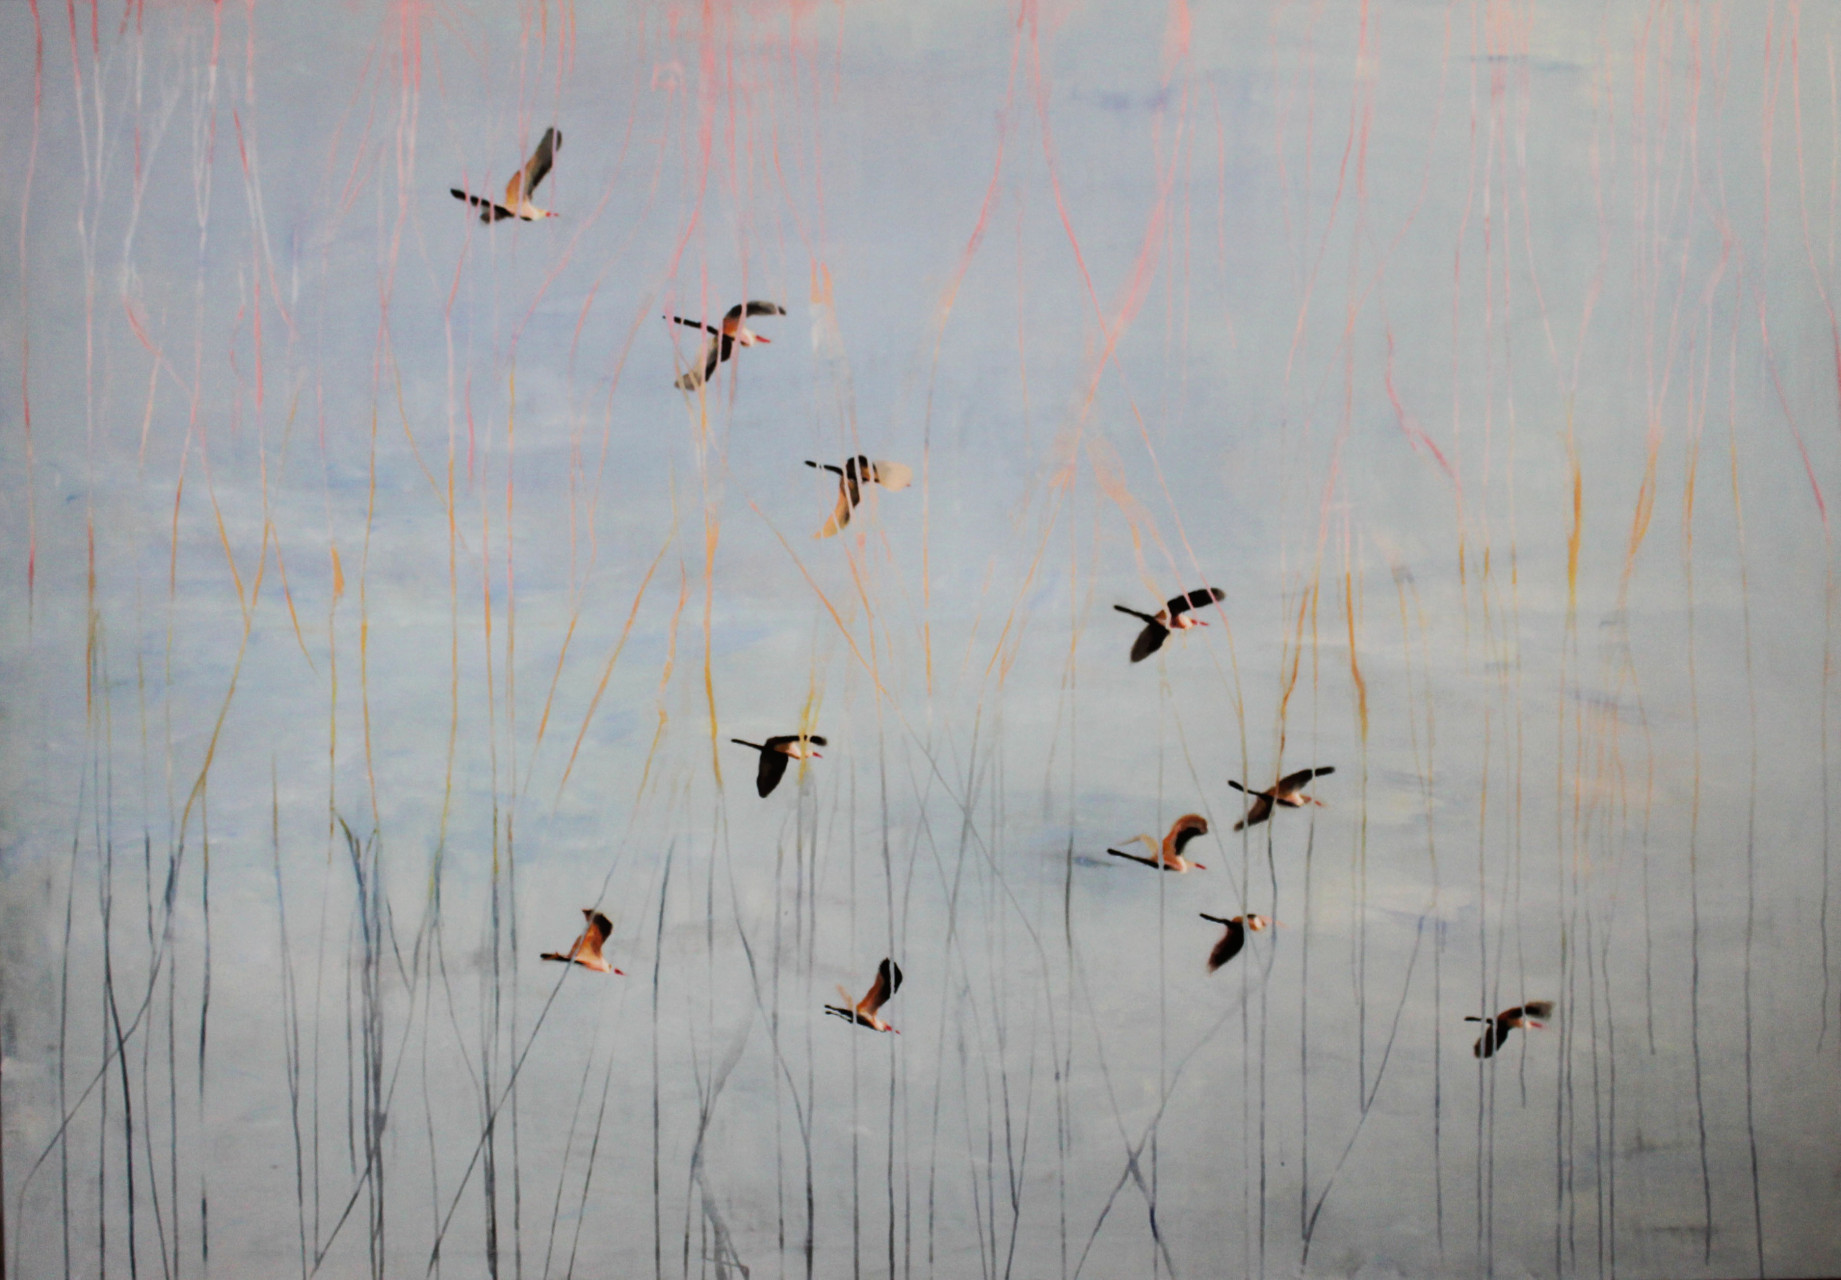 Vogelschwarm, 2016, Mischtechnik  140 x 200 cm. Sold